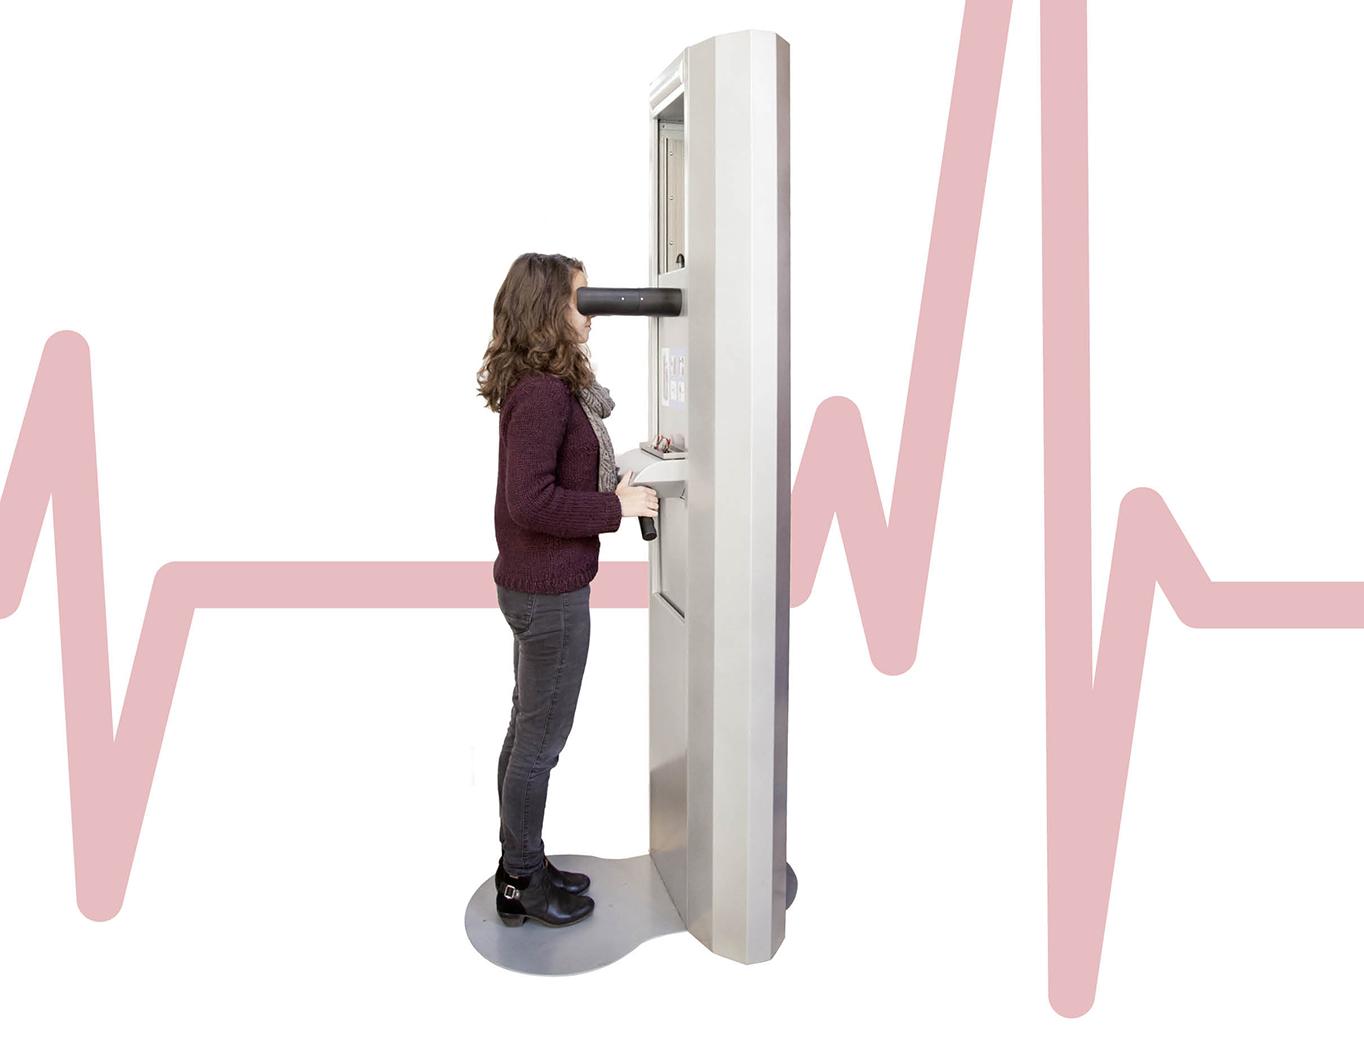 anxiété CHU toulouse machine test